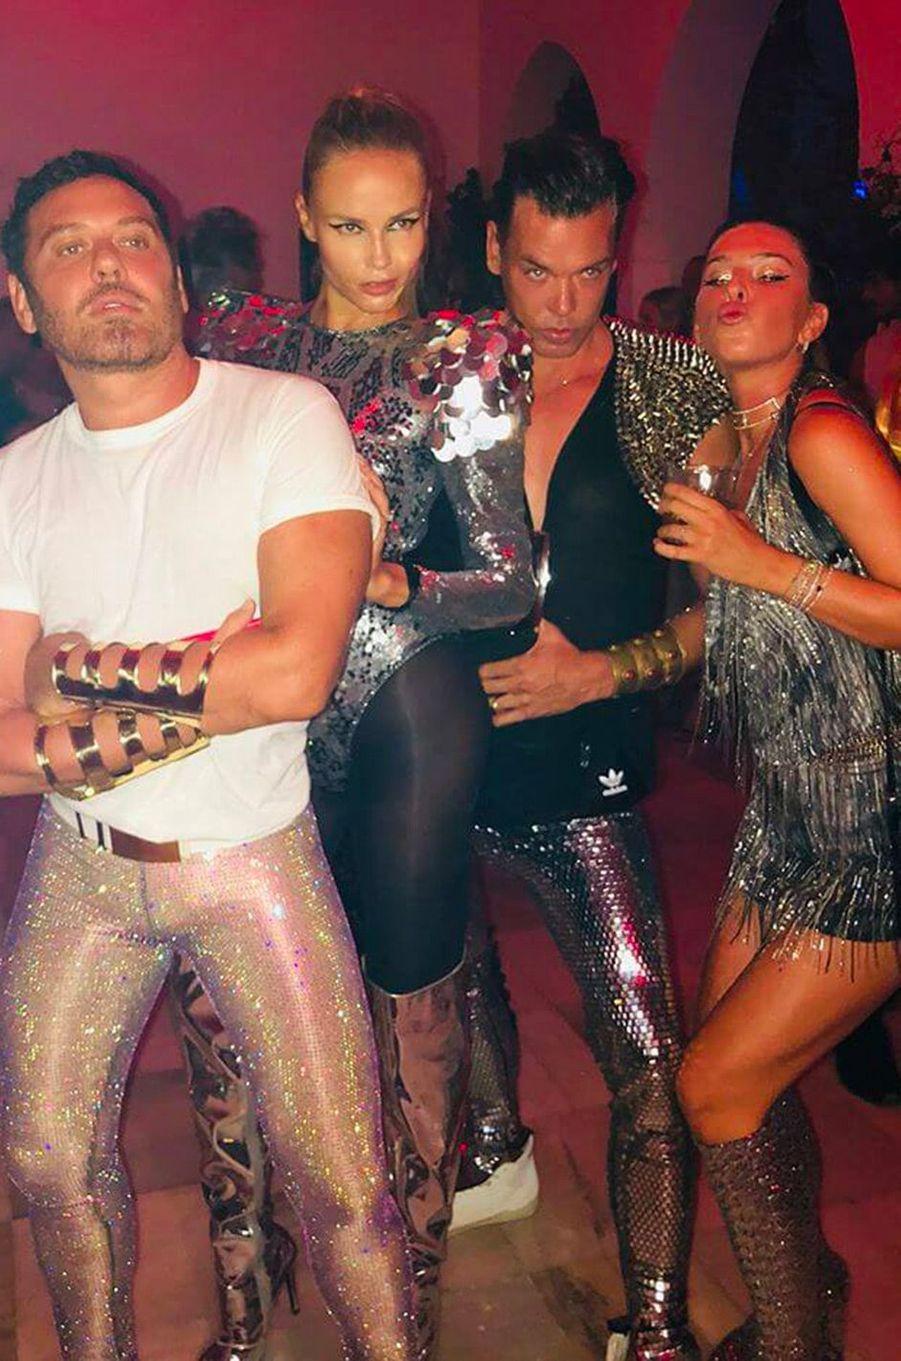 Natasha Poly avec Marcus Piggott et Mert Alas